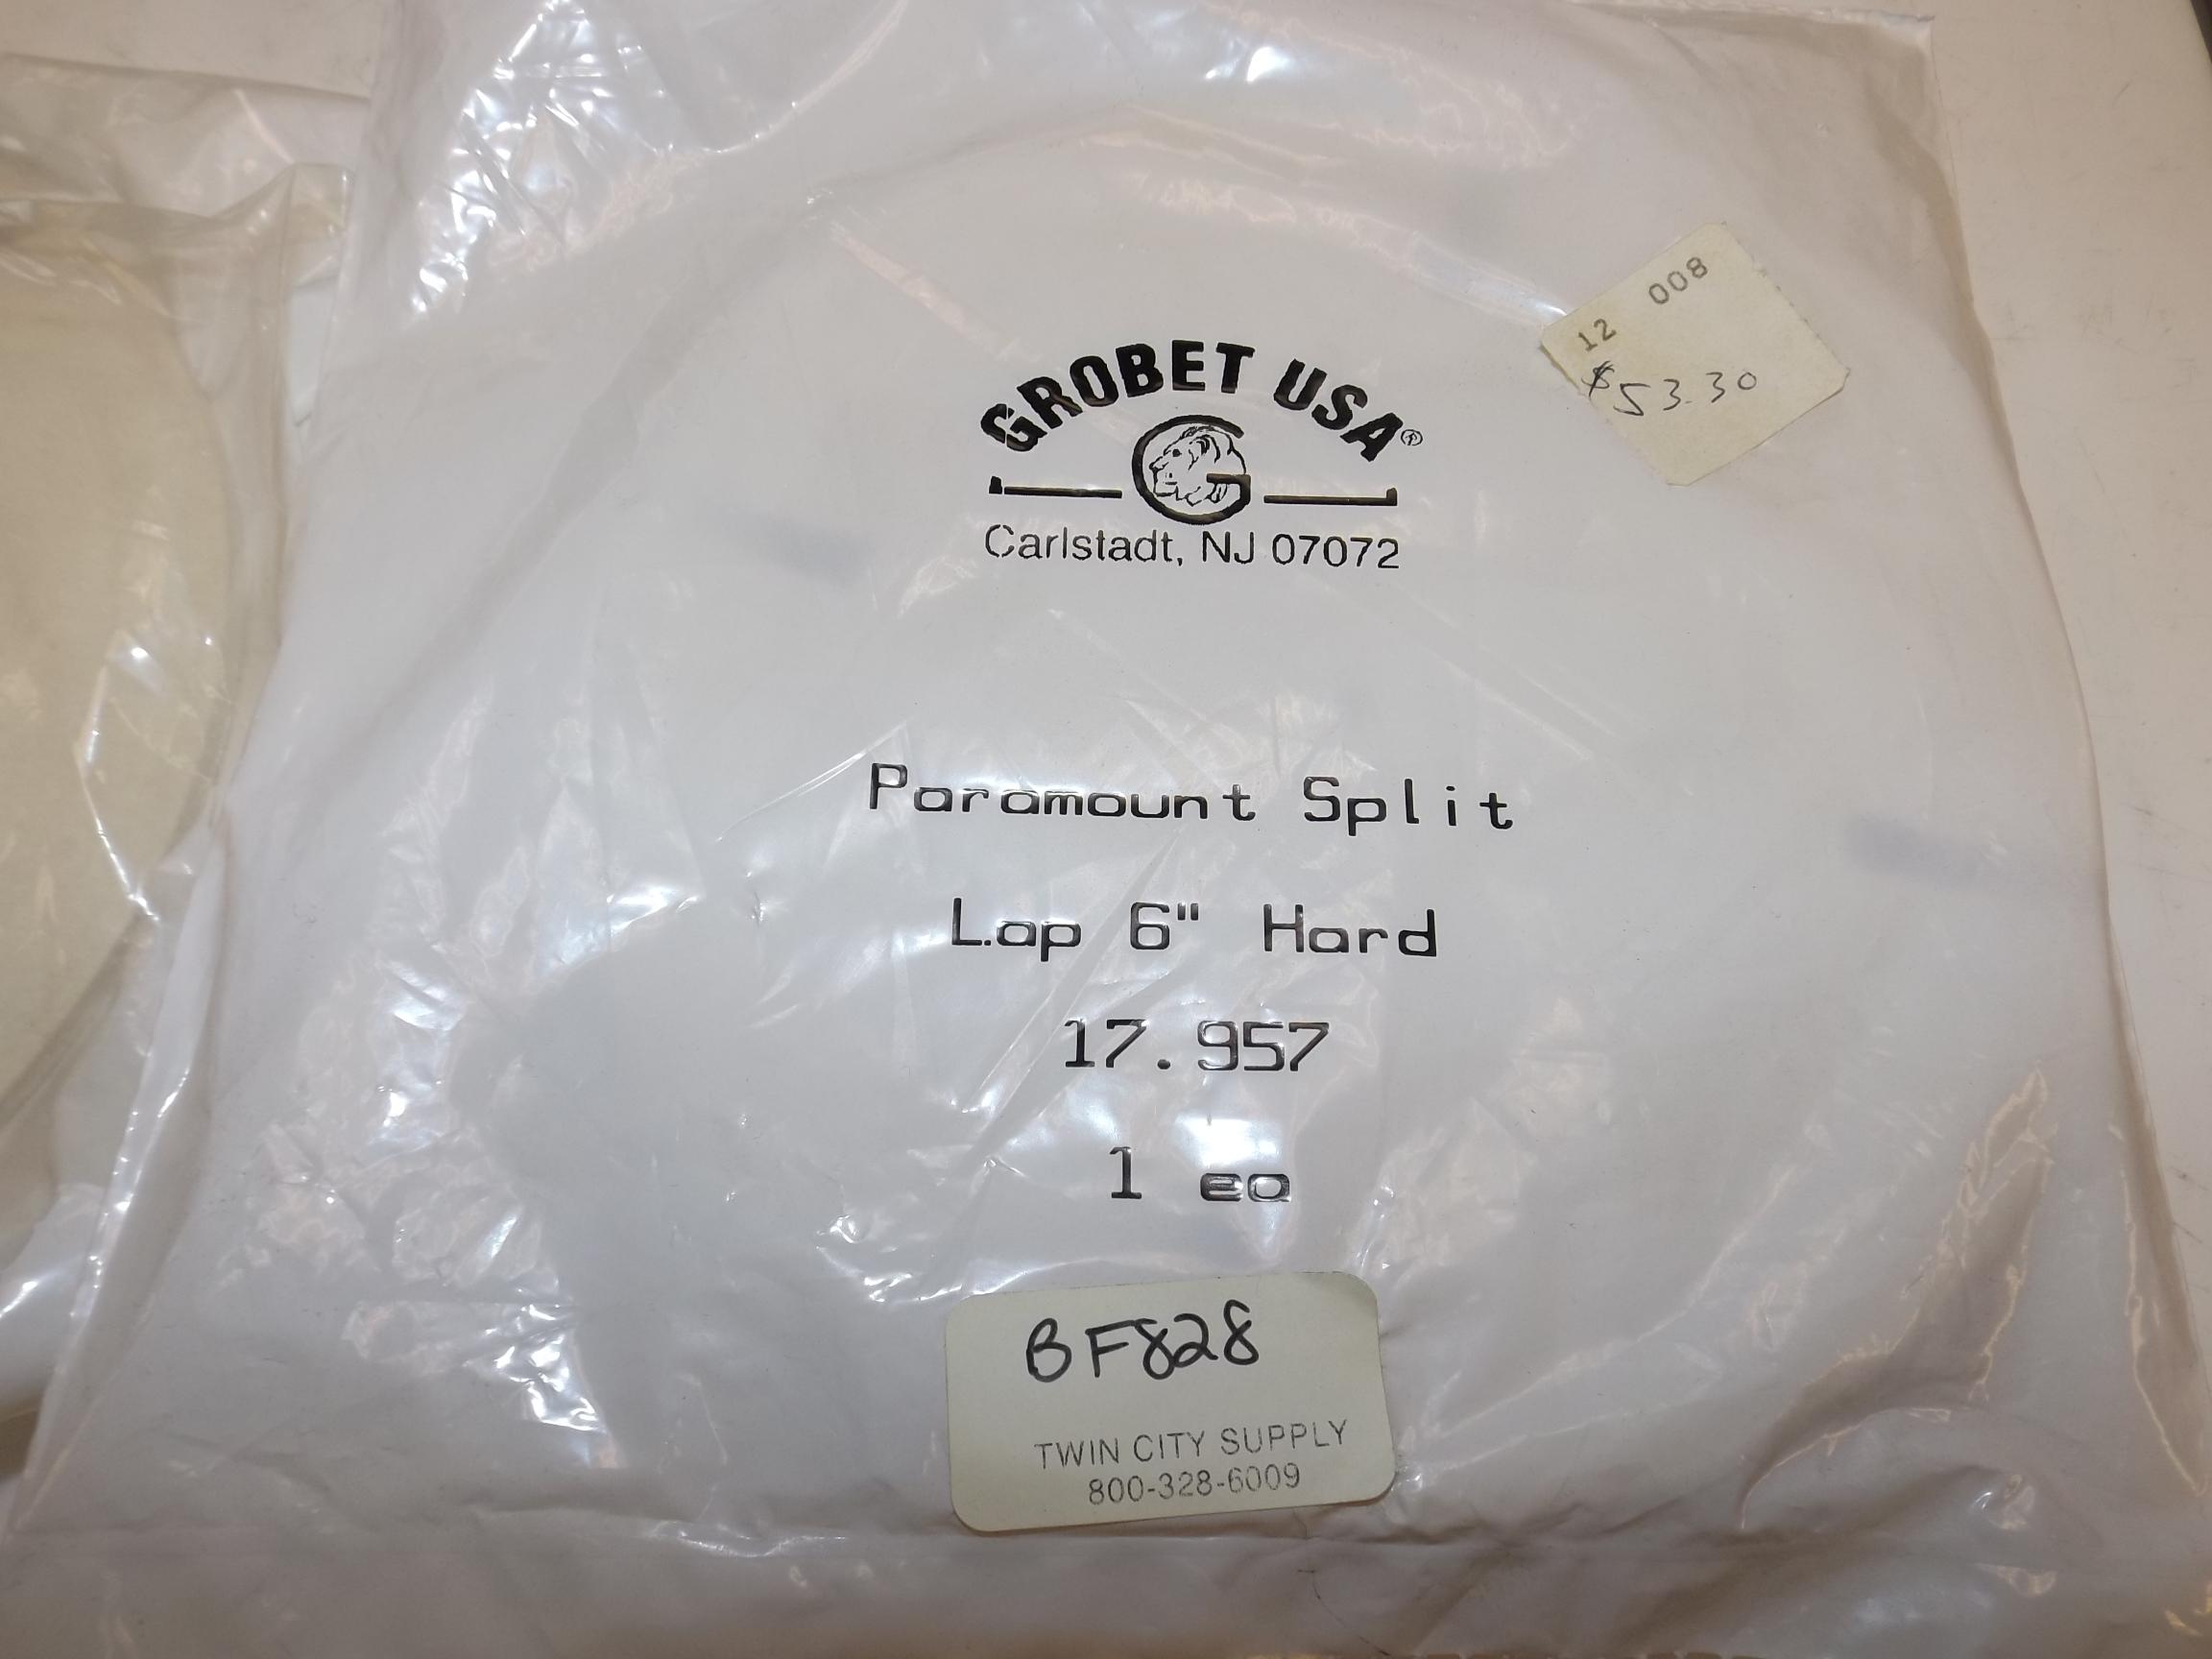 "BF828 Paramount Felt Split Laps-- 6"" Hard Grobet # 17.957"